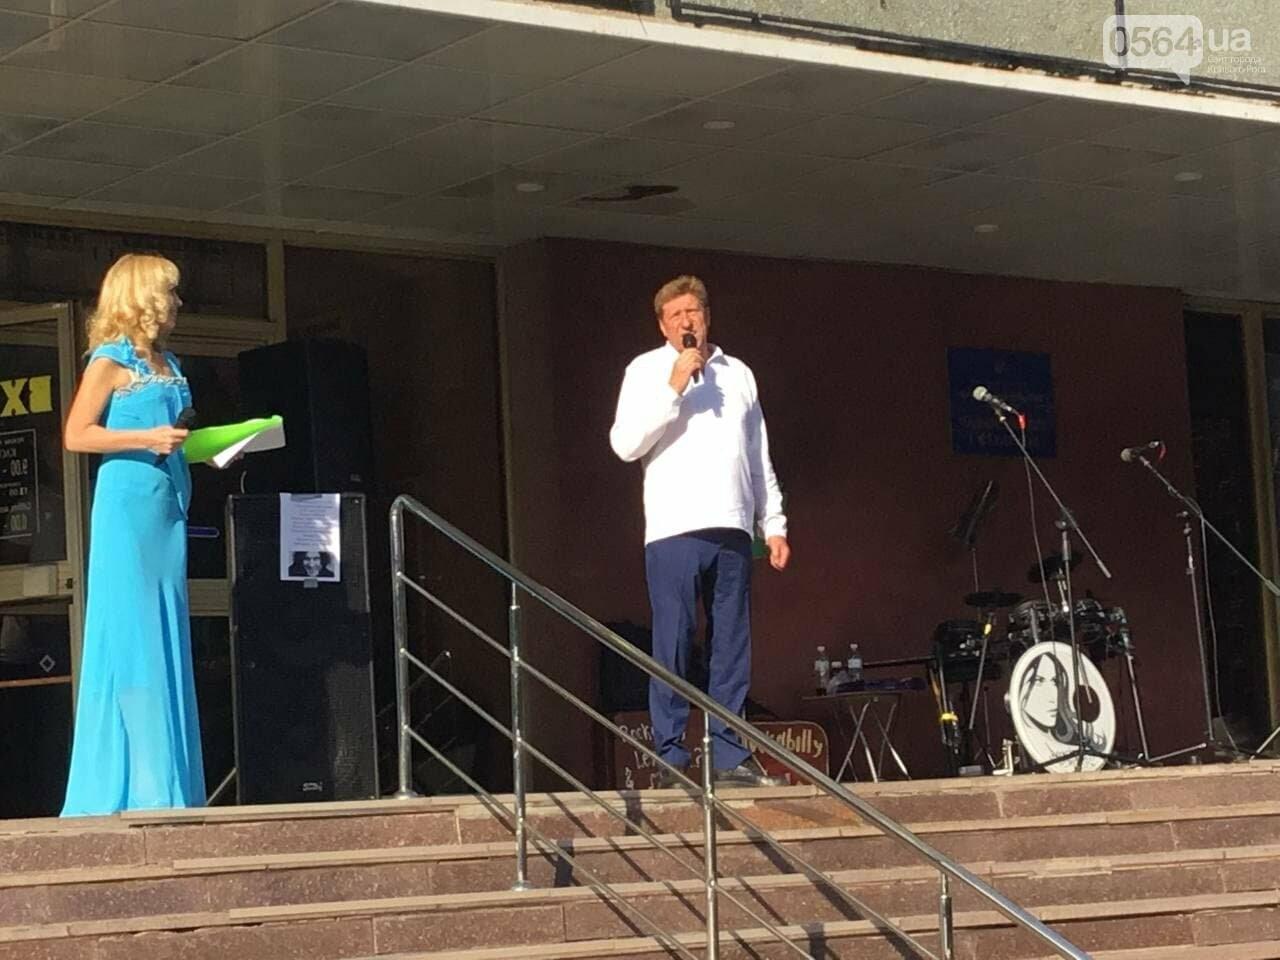 18 конкурсантов представили своё творчество на 5-м Криворожском фестивале имени Кузьмы Скрябина, - ФОТО, ВИДЕО, фото-4